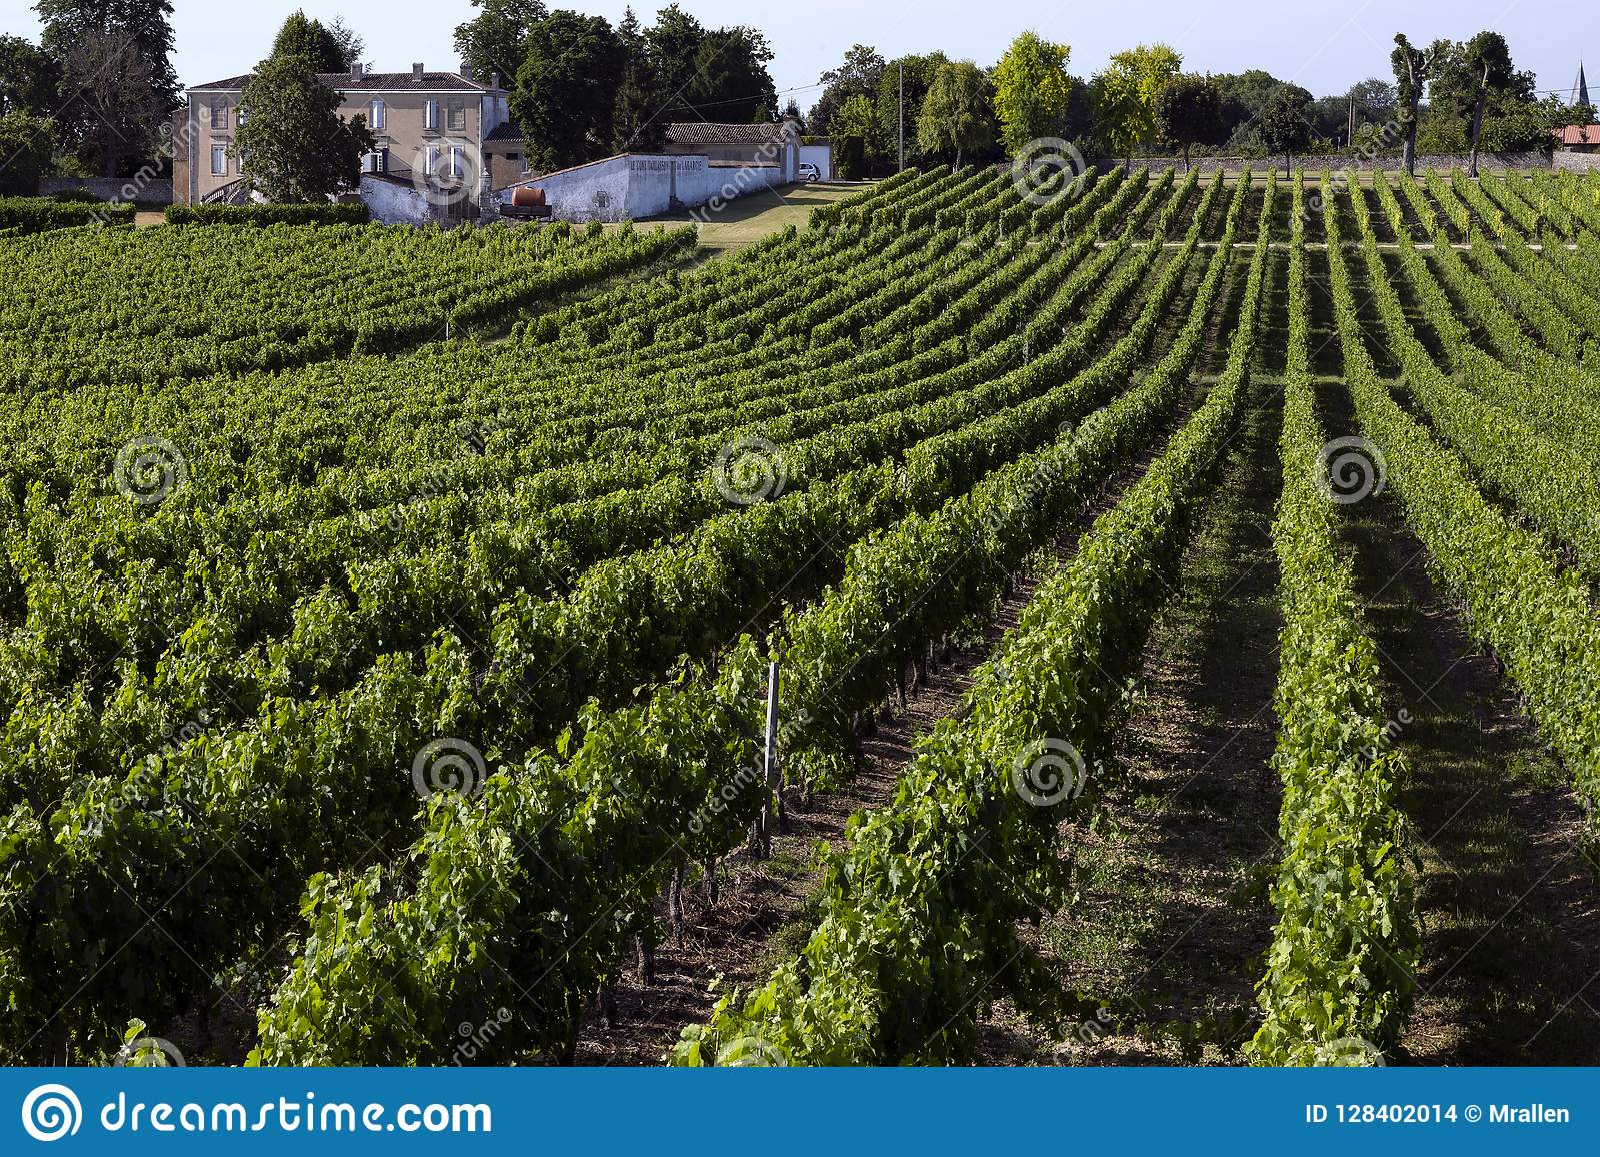 Wine Production - Vineyard - Dordogne - France